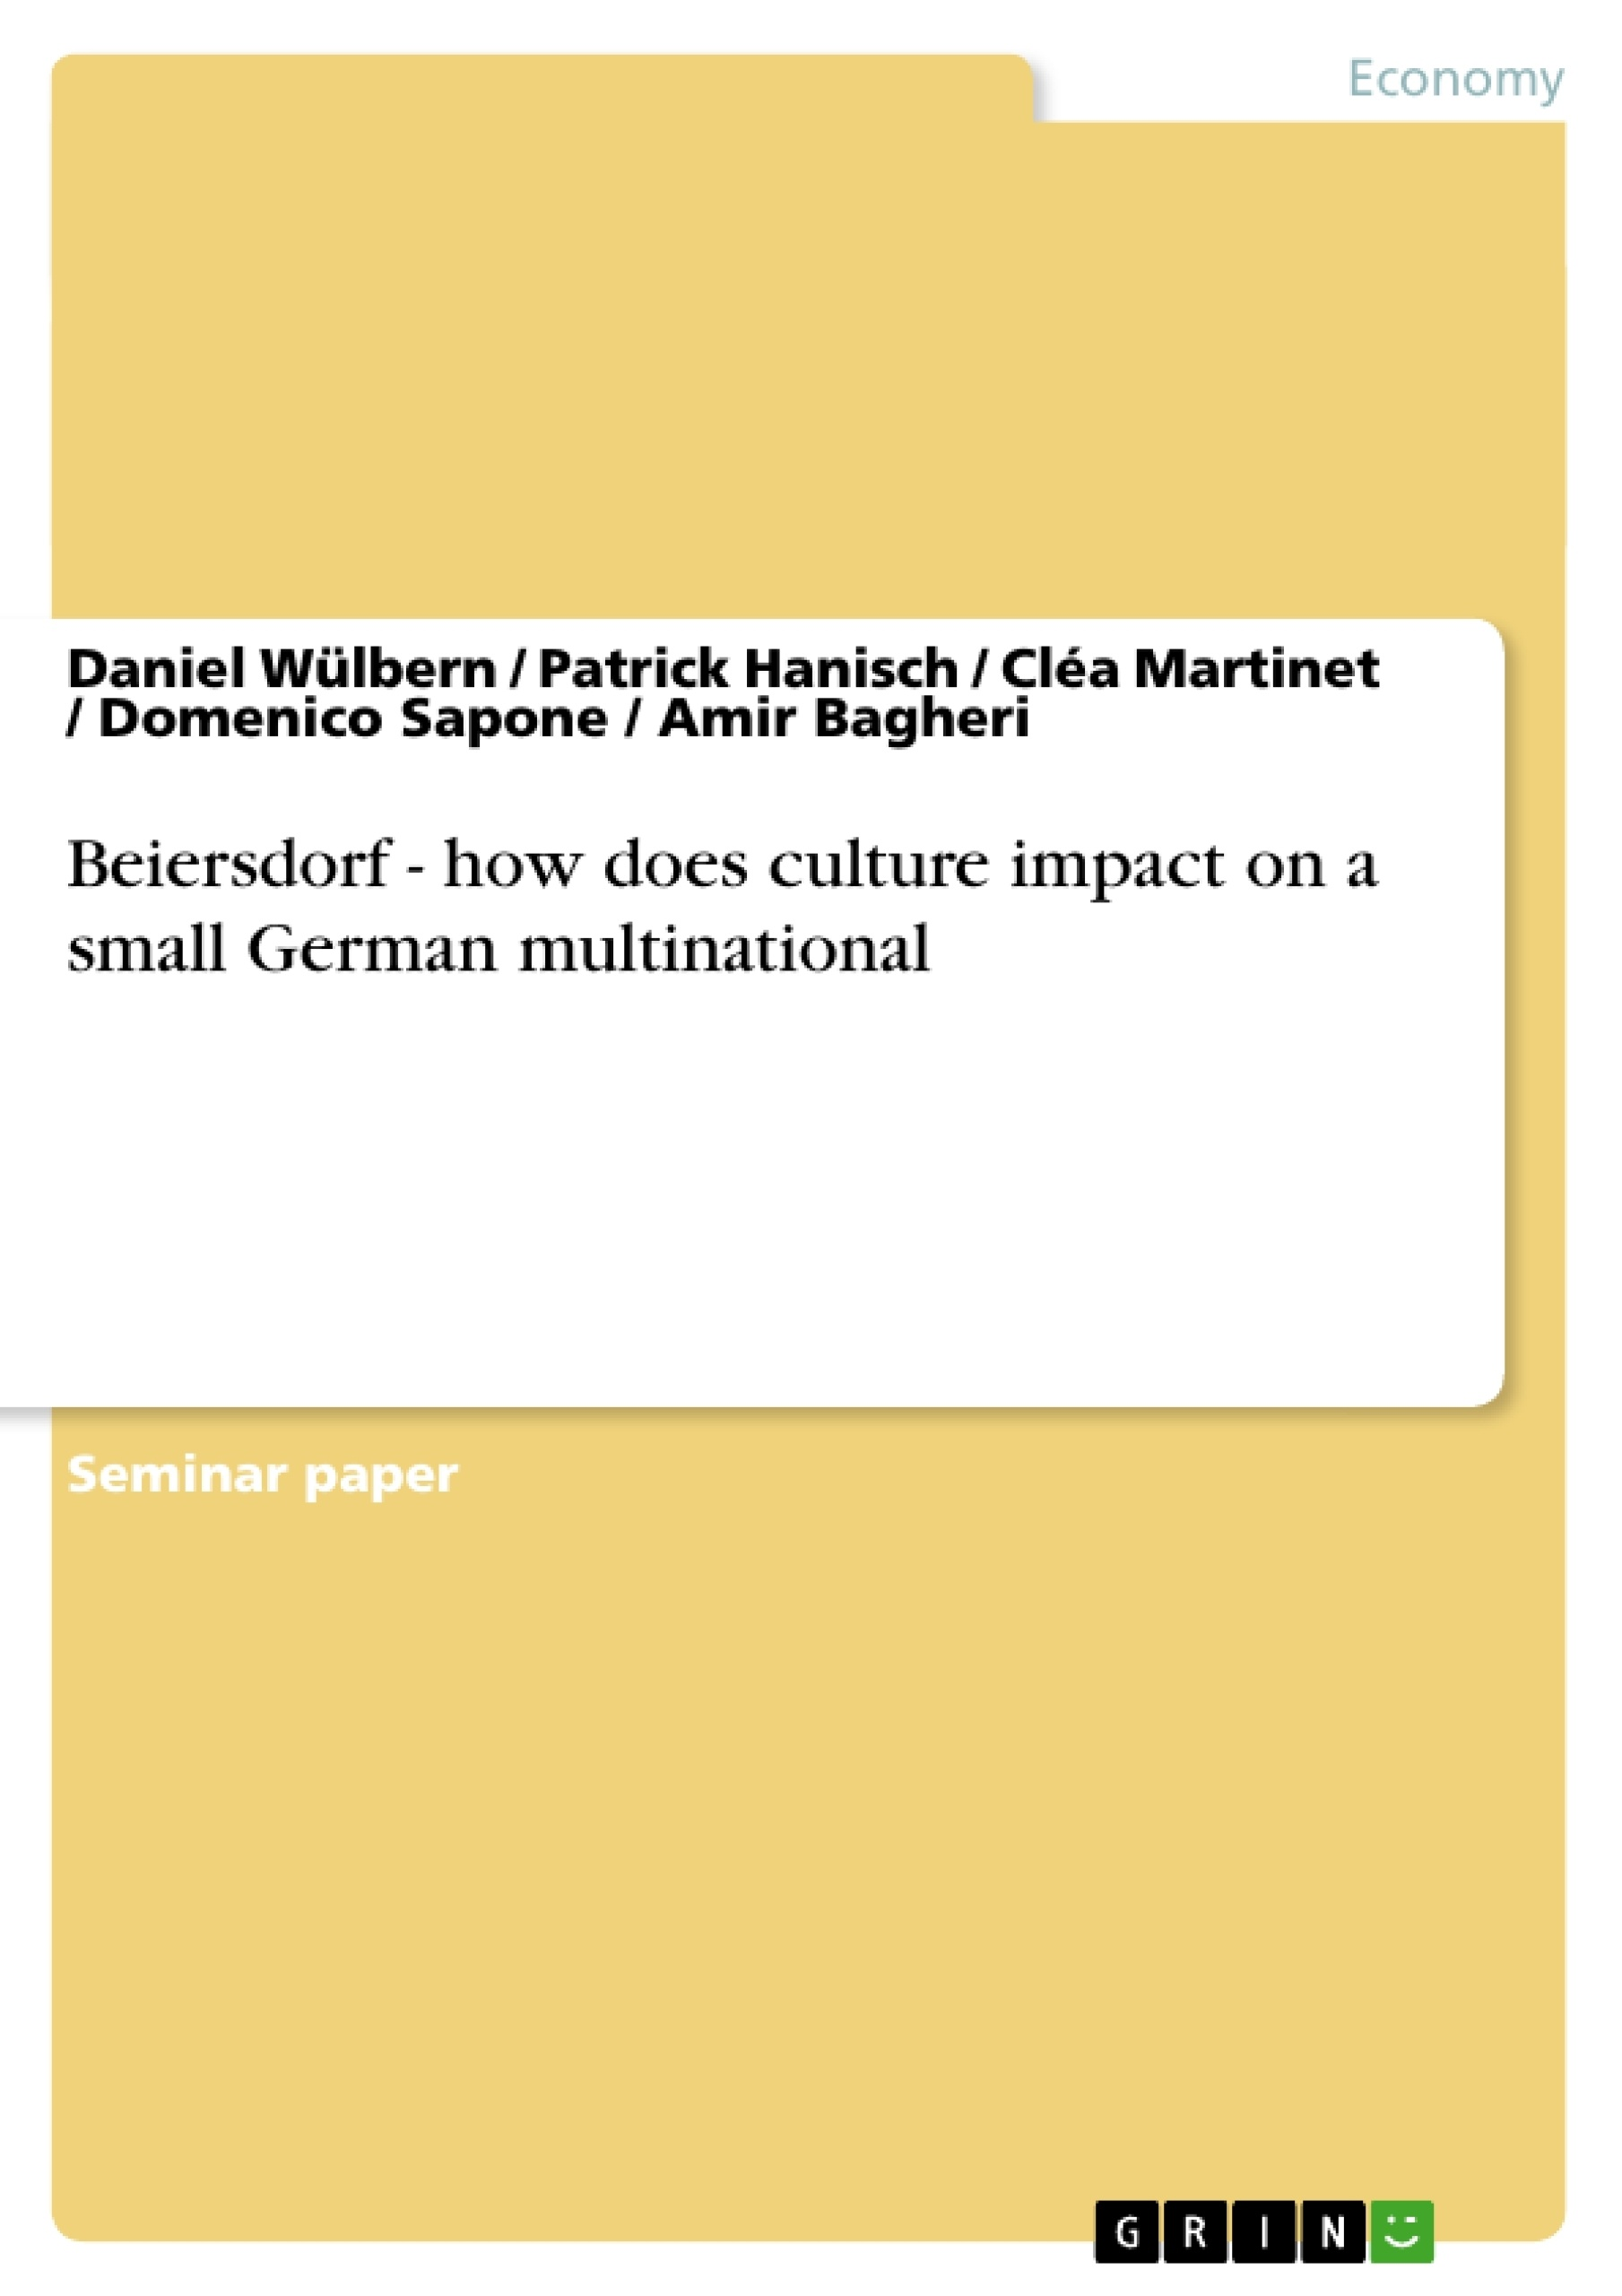 Write an essay on multinational corporate culture